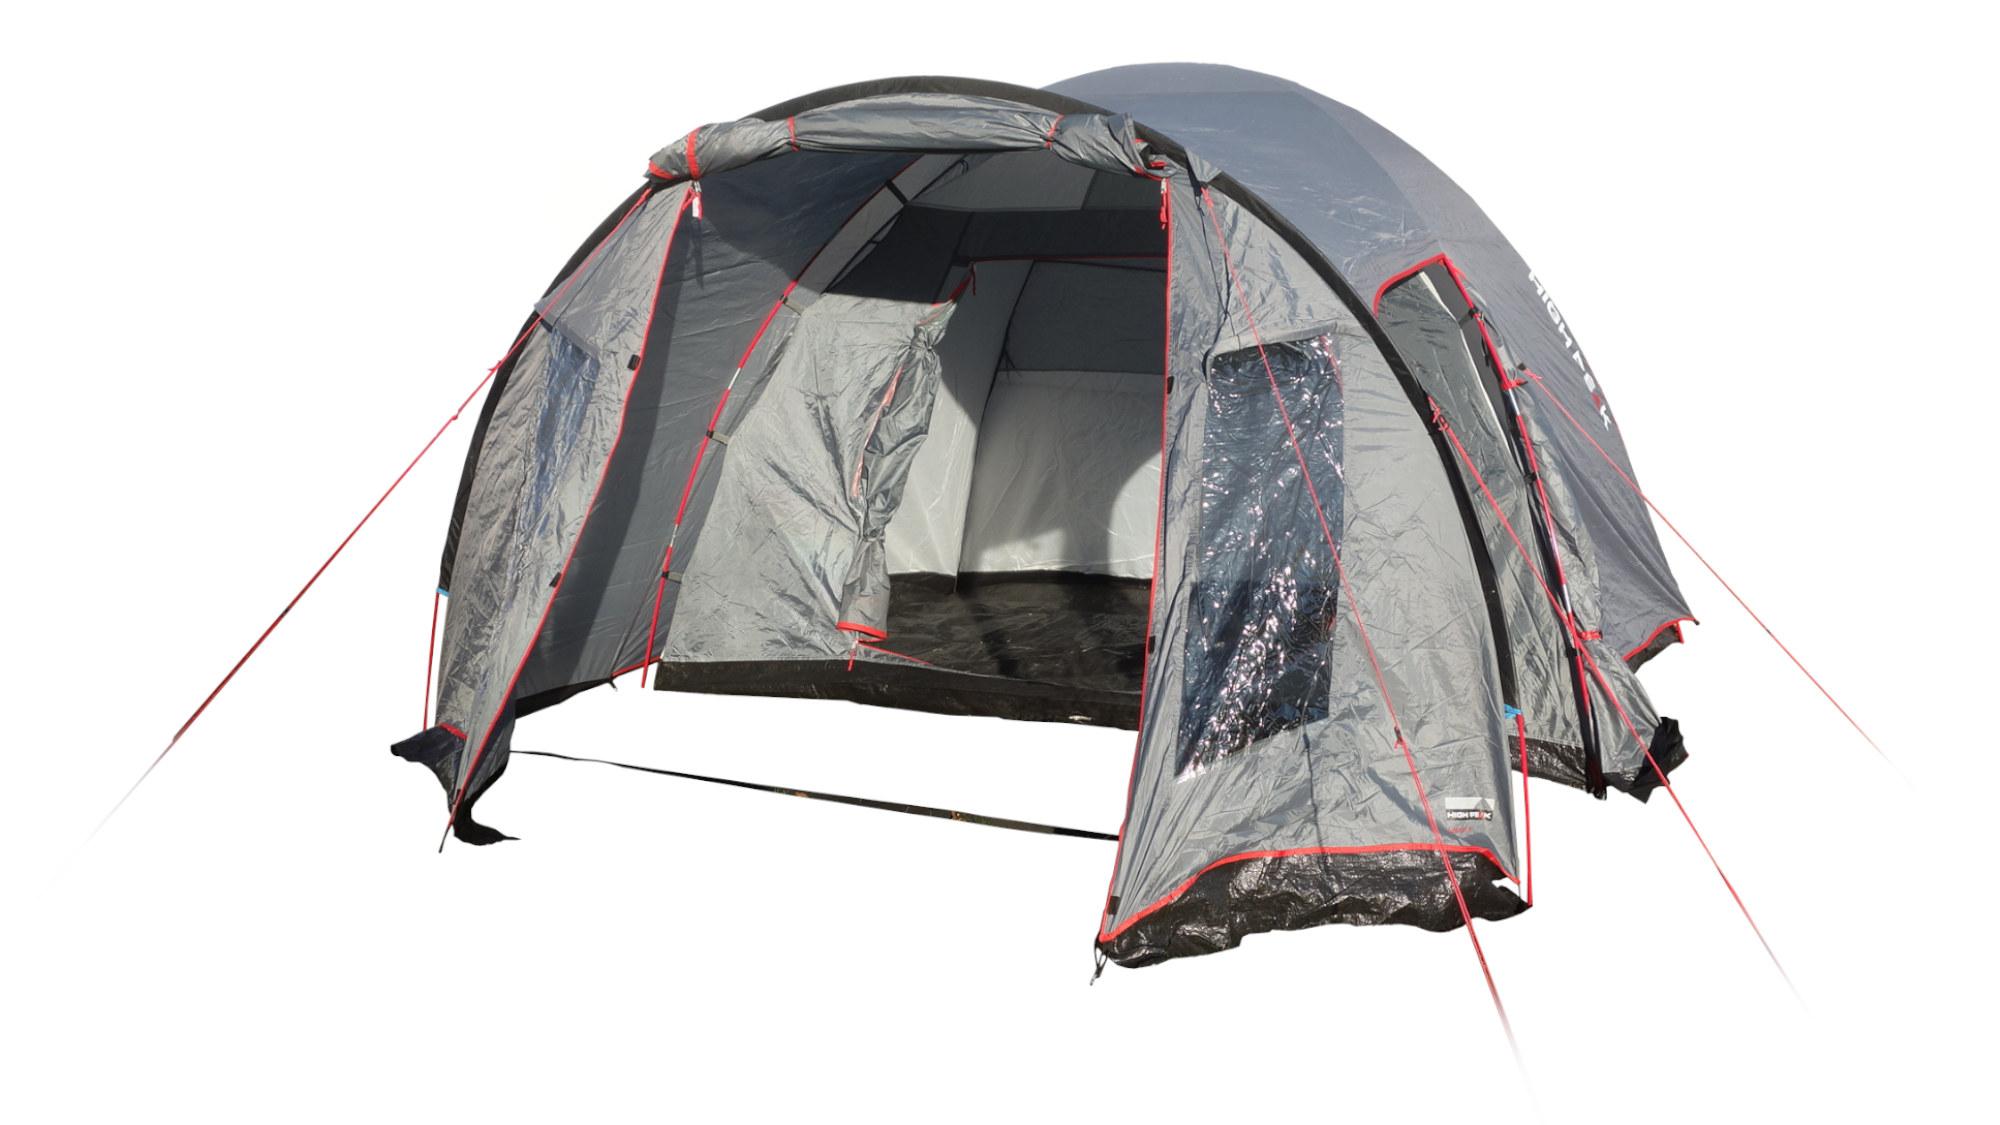 5-Personen-Zelt leihen